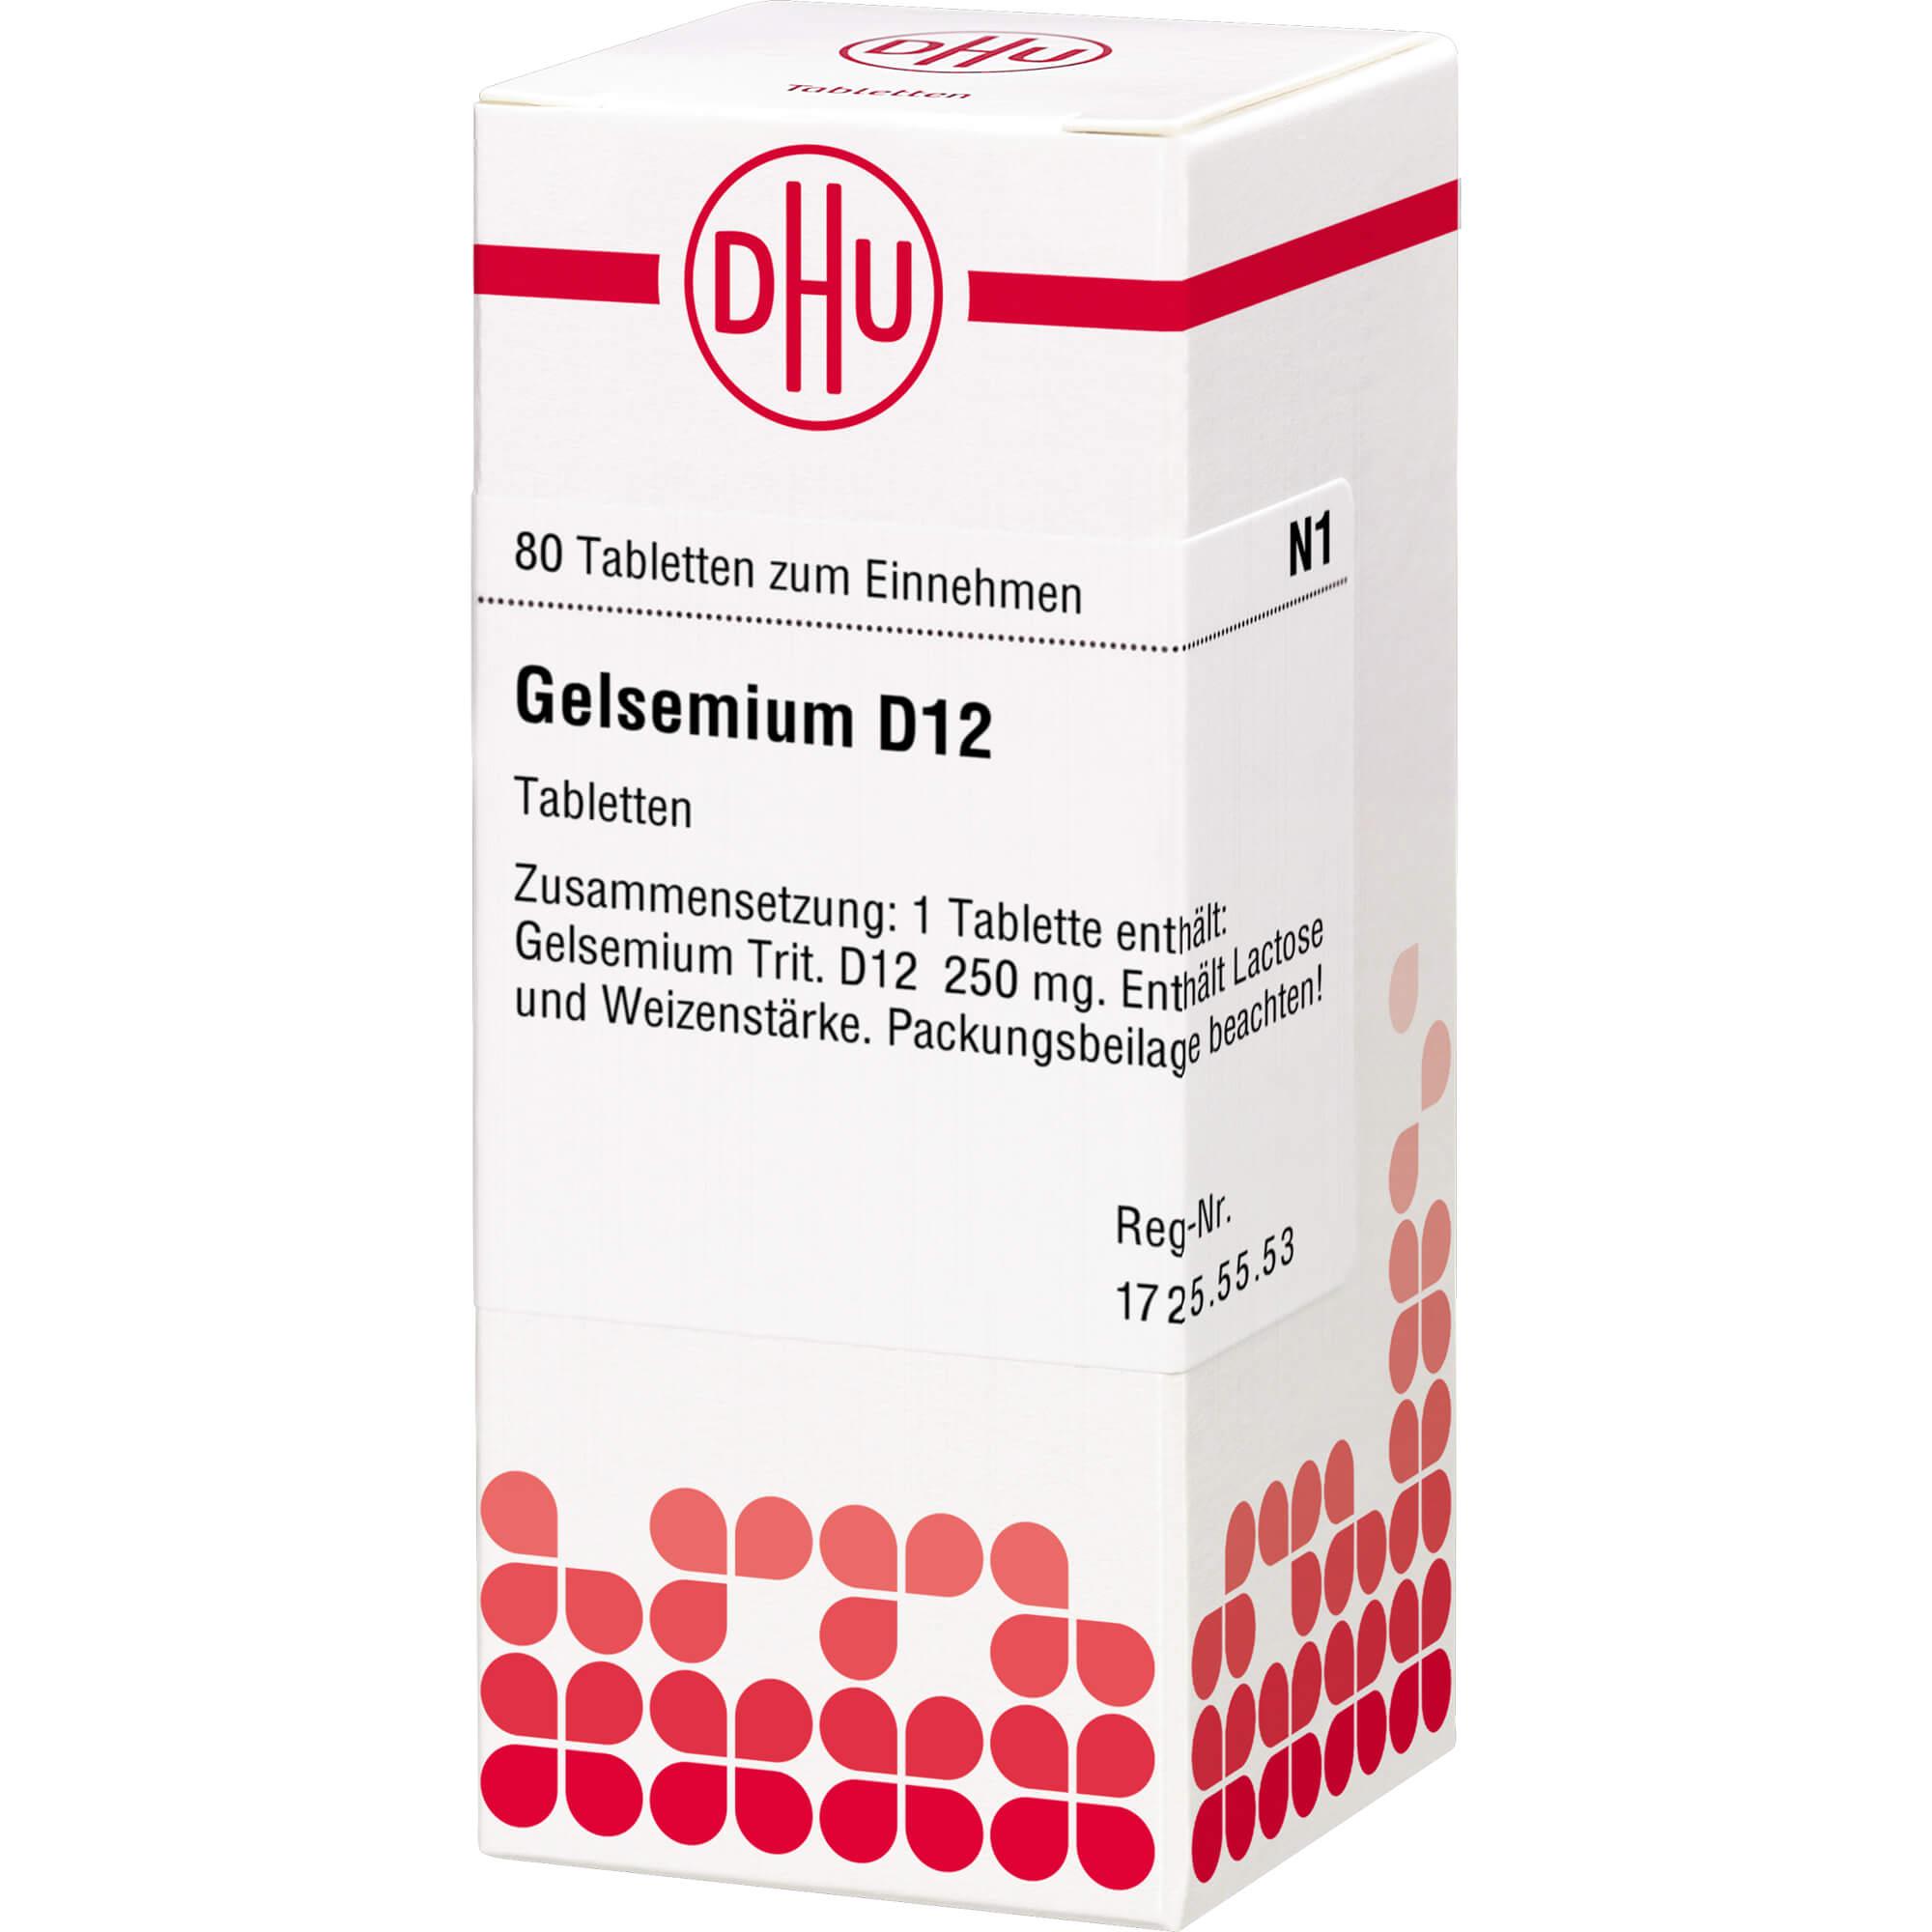 GELSEMIUM D 12 Tabletten